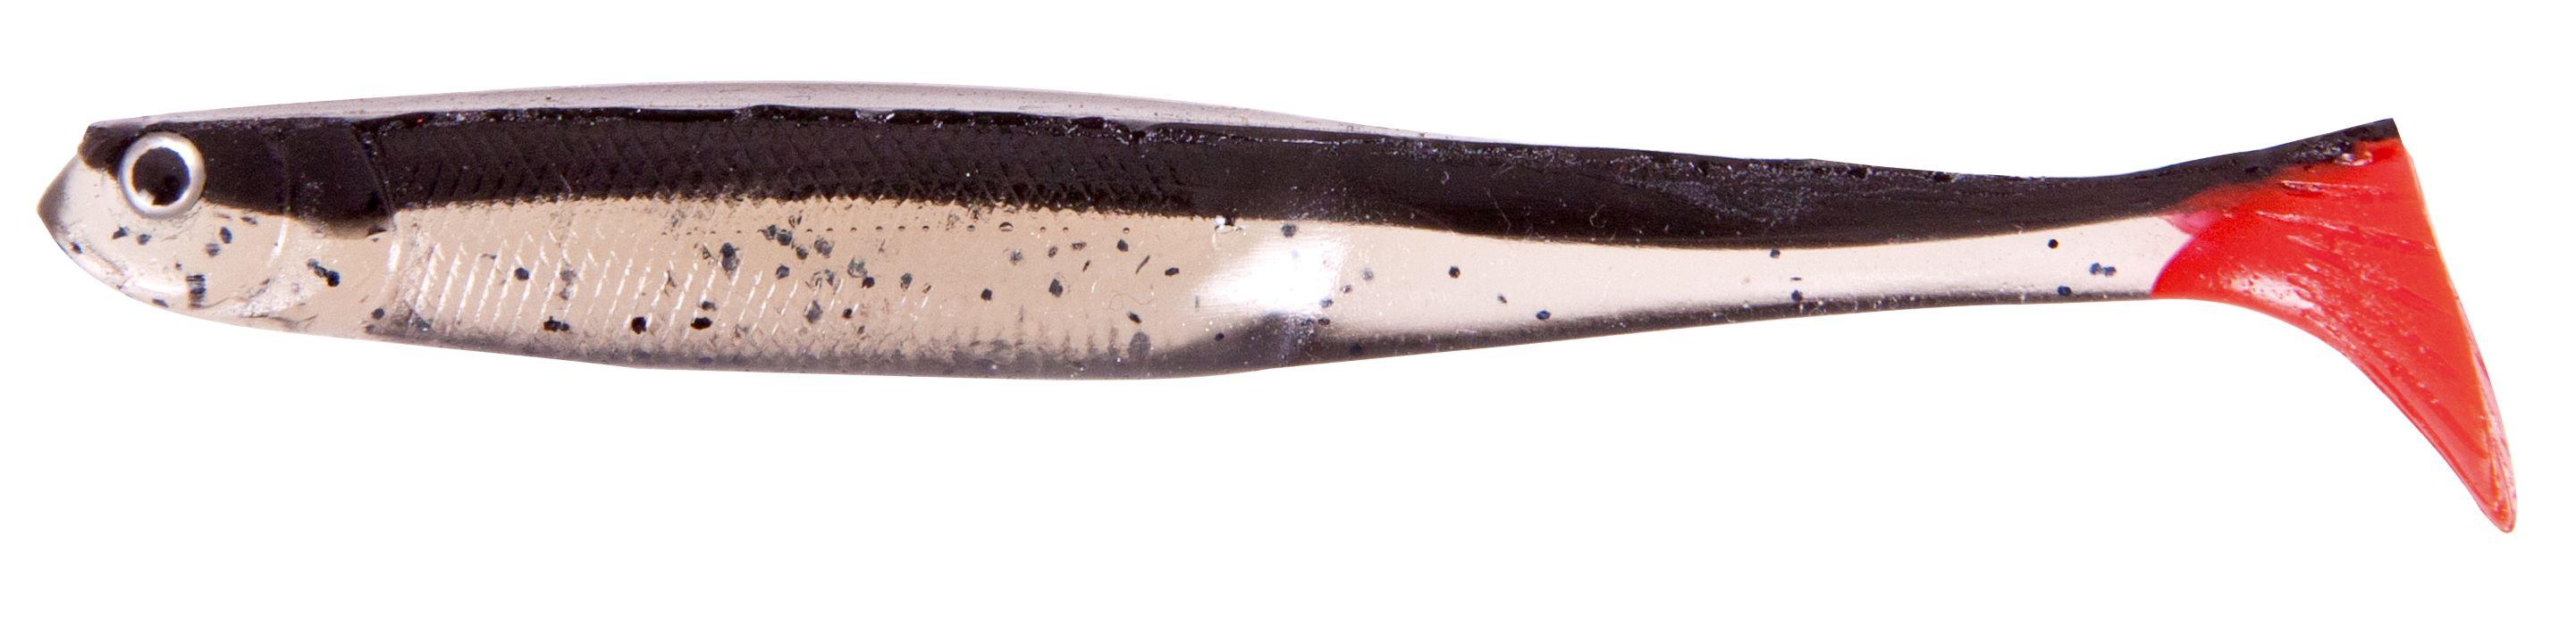 Iron Claw gumová nástraha Slim Jim 13 cm Vzor CB, 3 ks